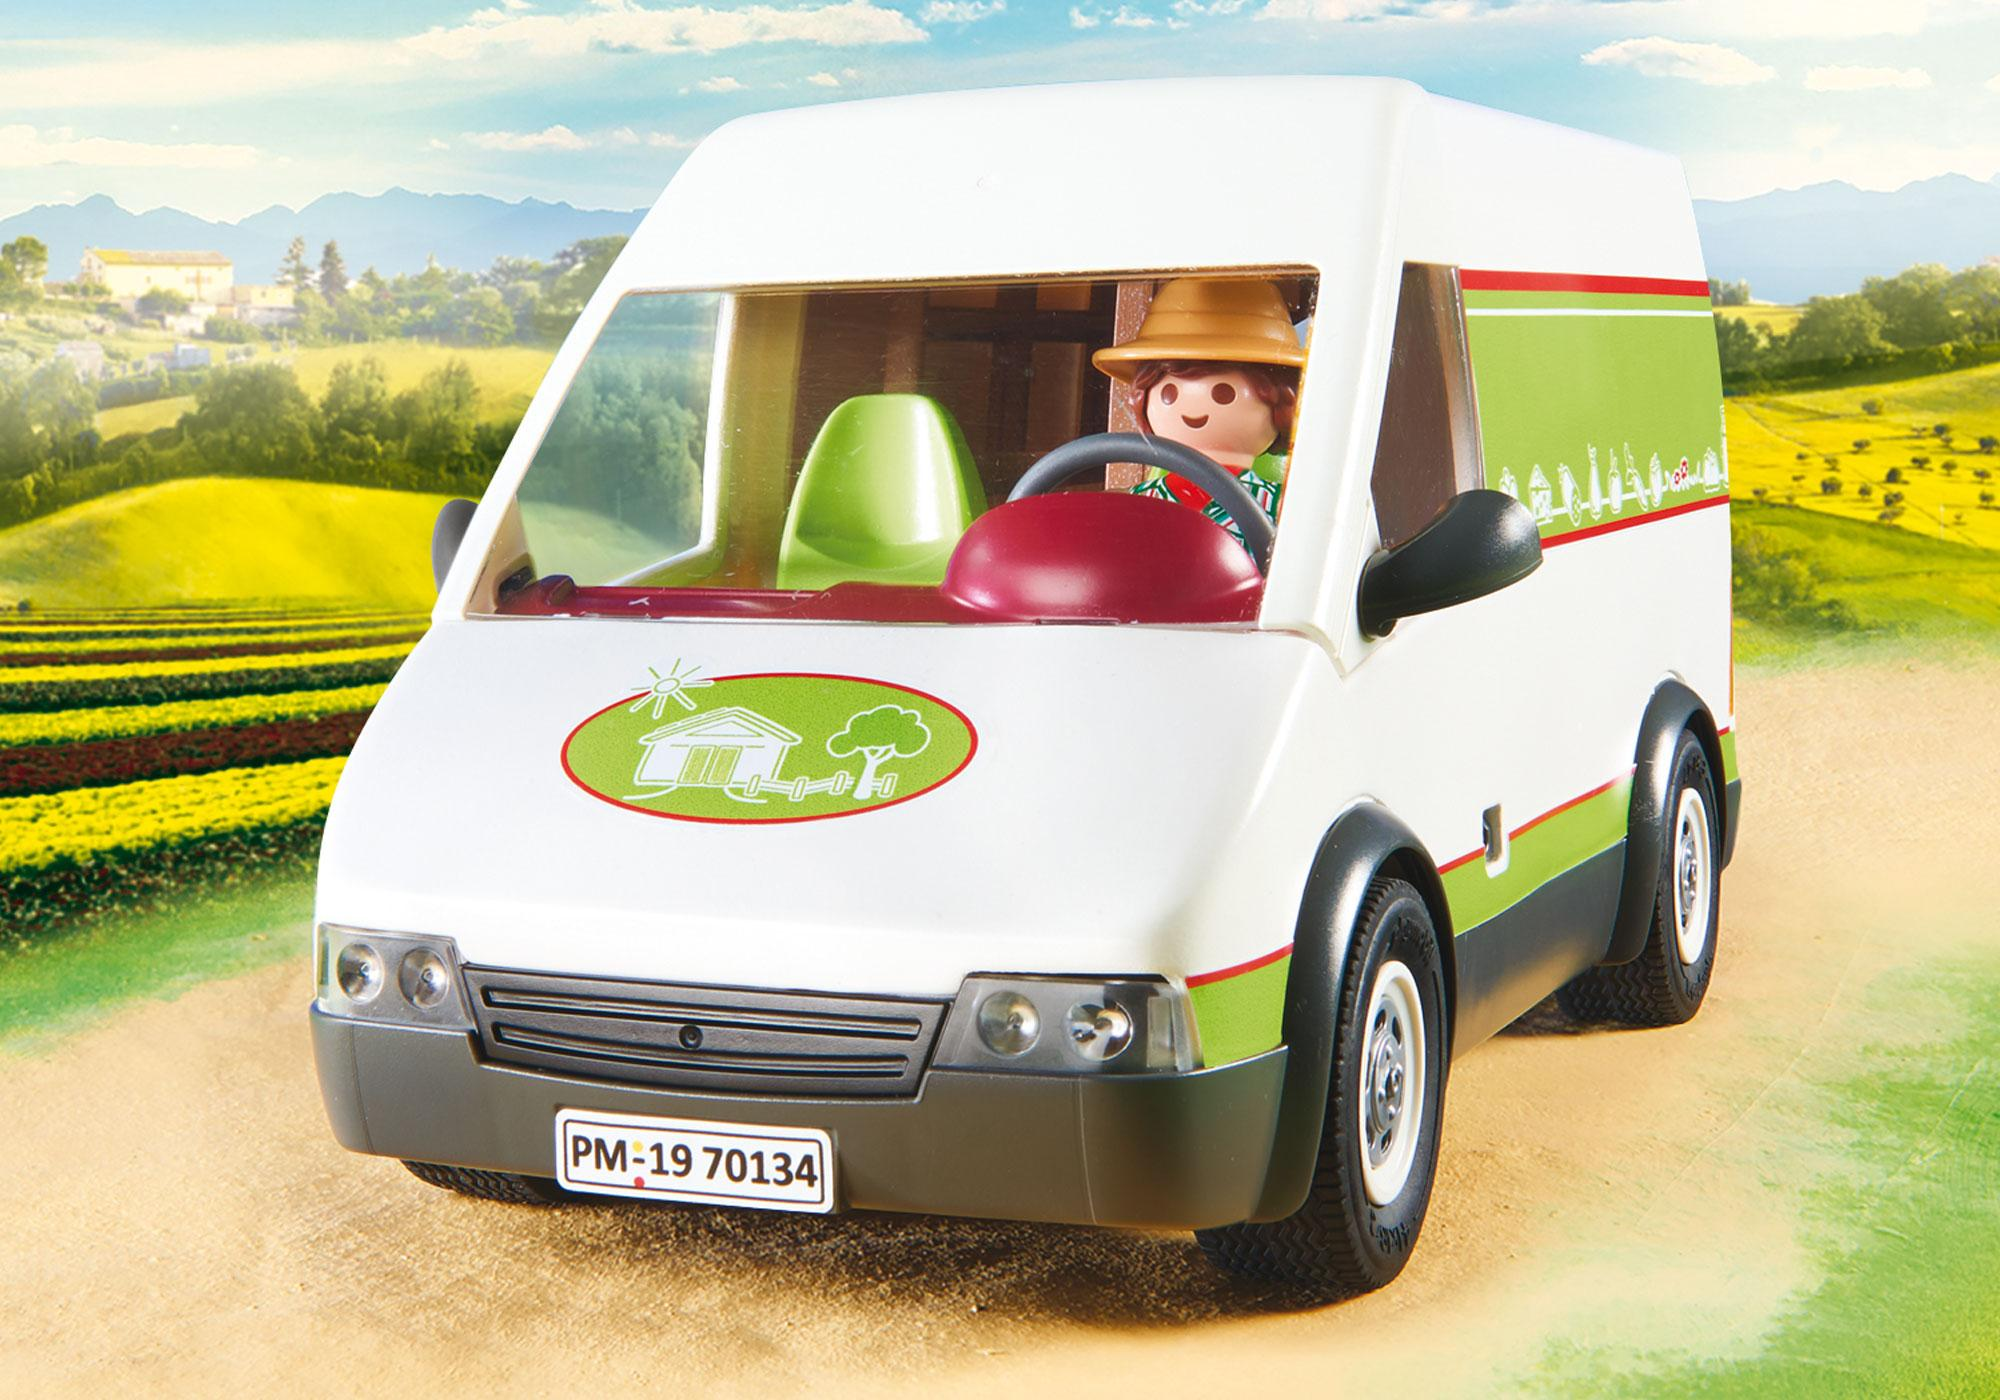 http://media.playmobil.com/i/playmobil/70134_product_extra3/Marktkraamwagen